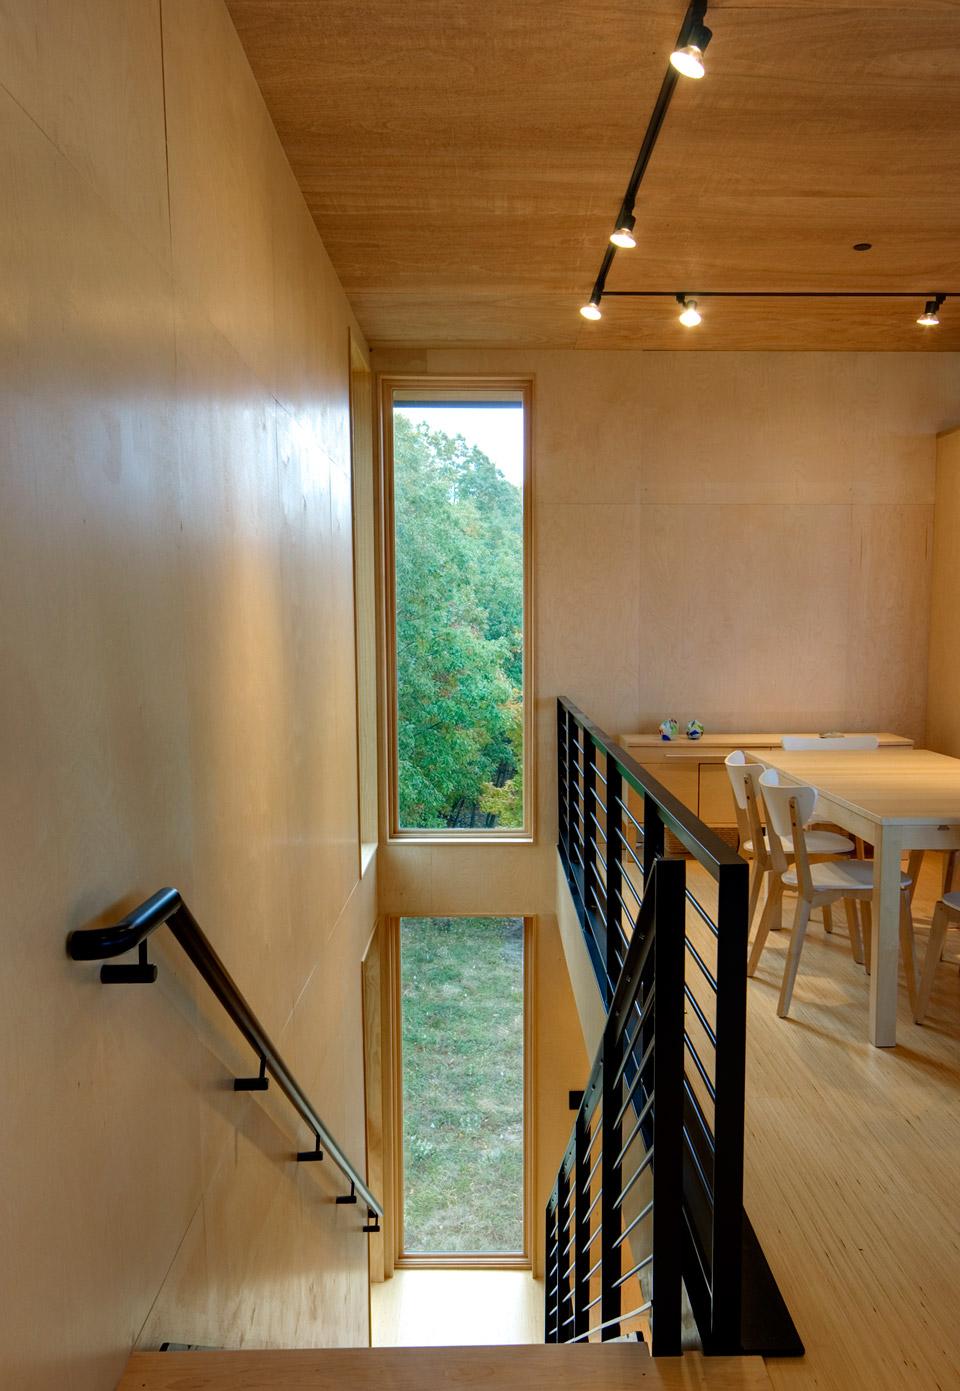 glen-lake-tower-balance-associates-architects-7